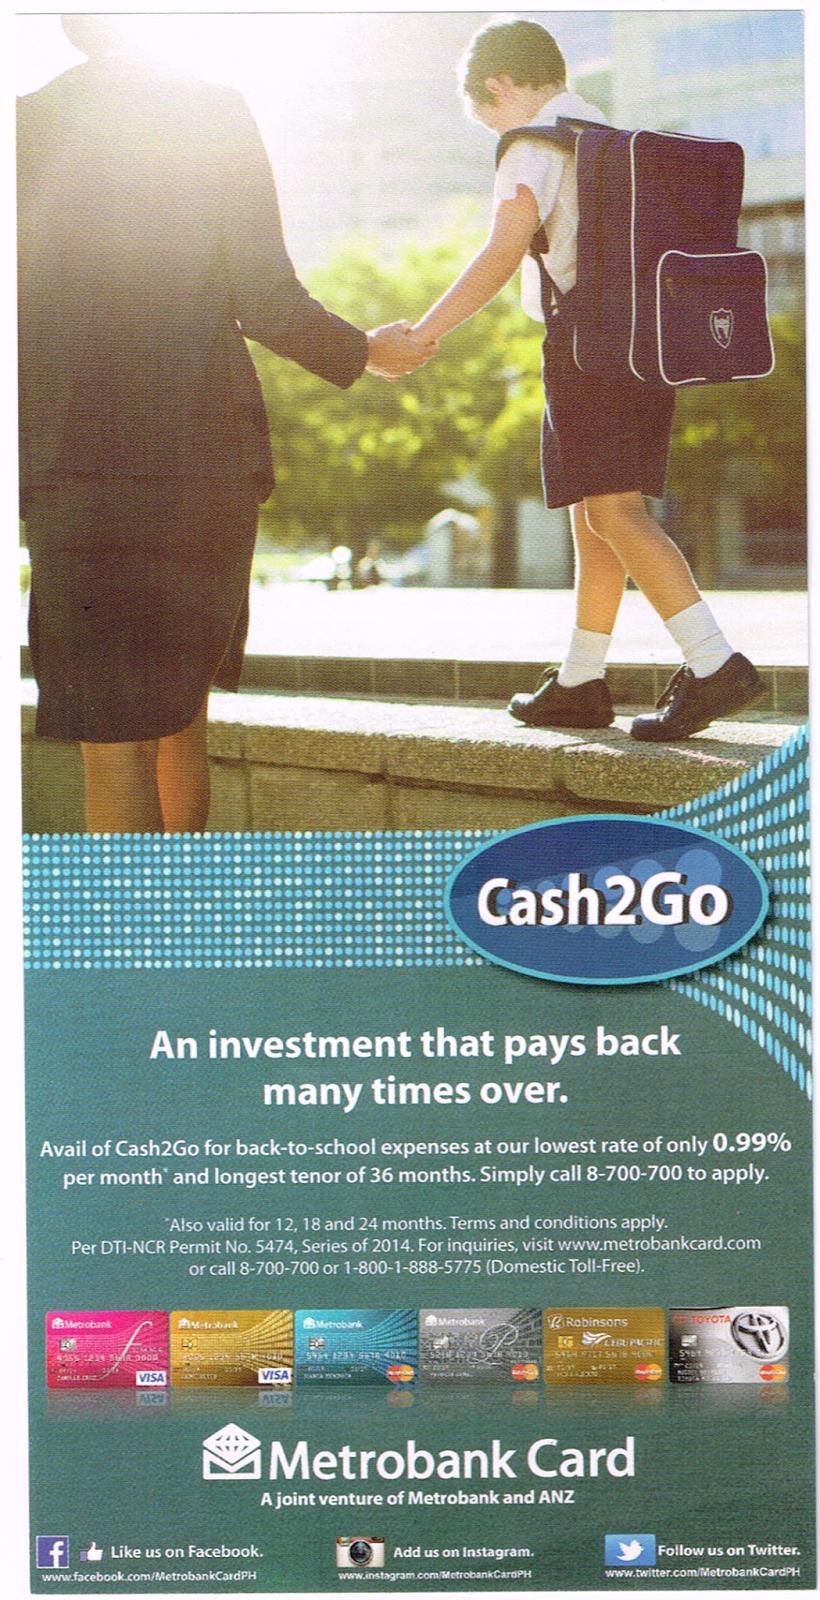 Metrobank CASH2GO